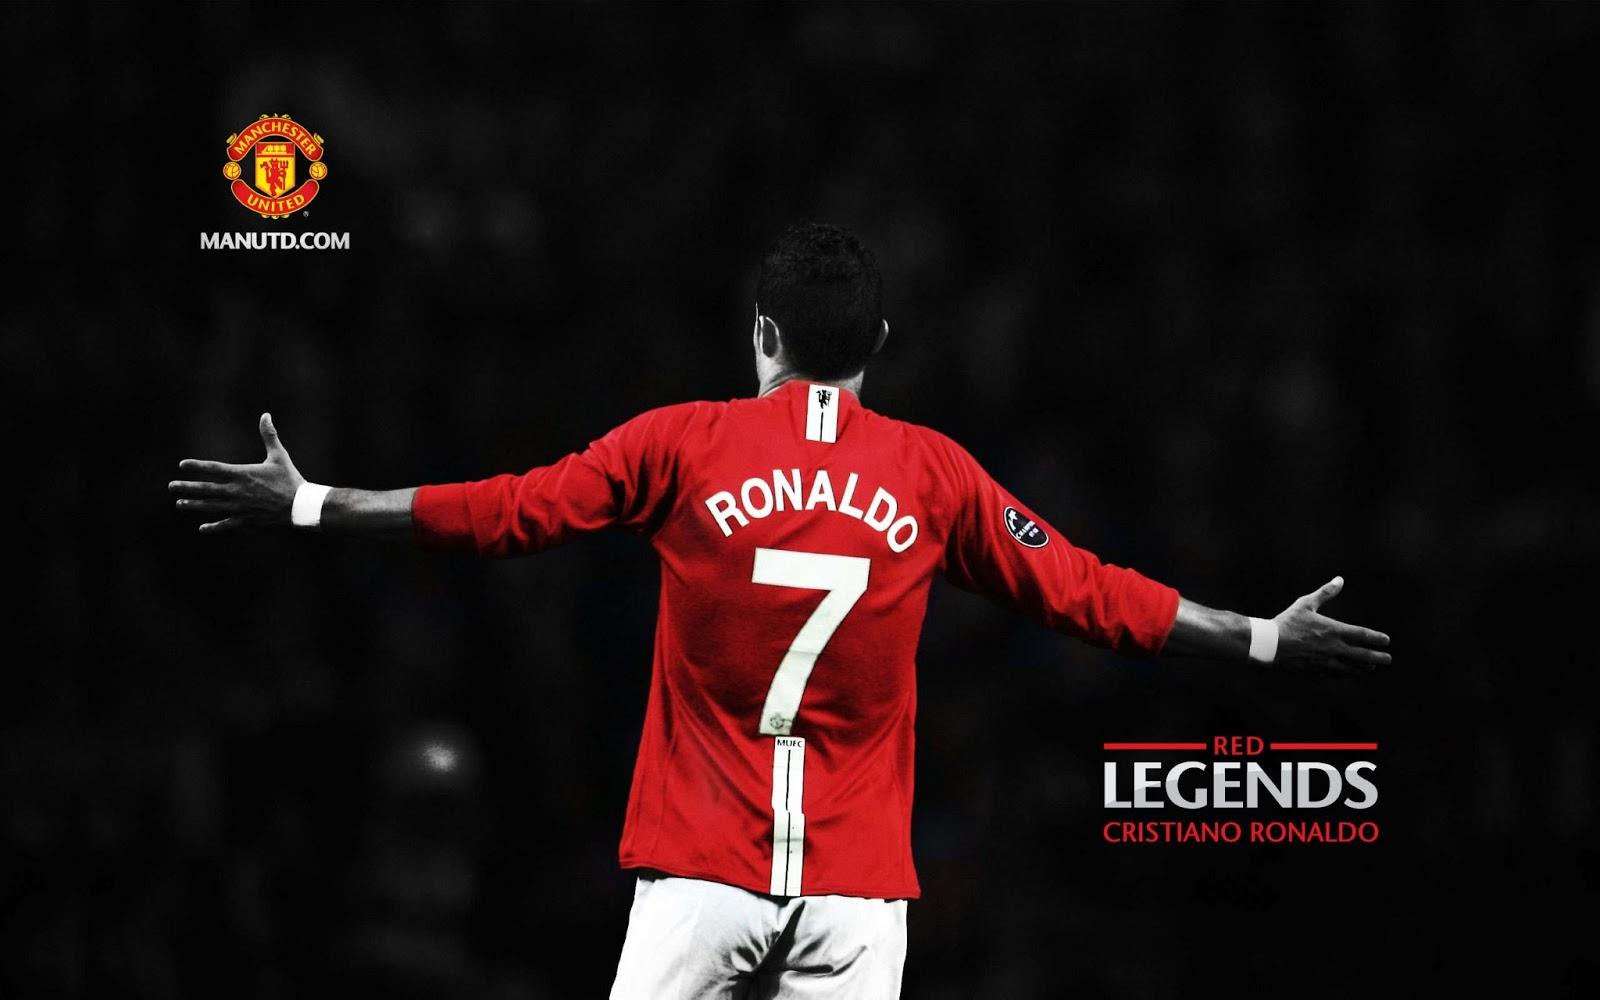 Manchester United Ronaldo